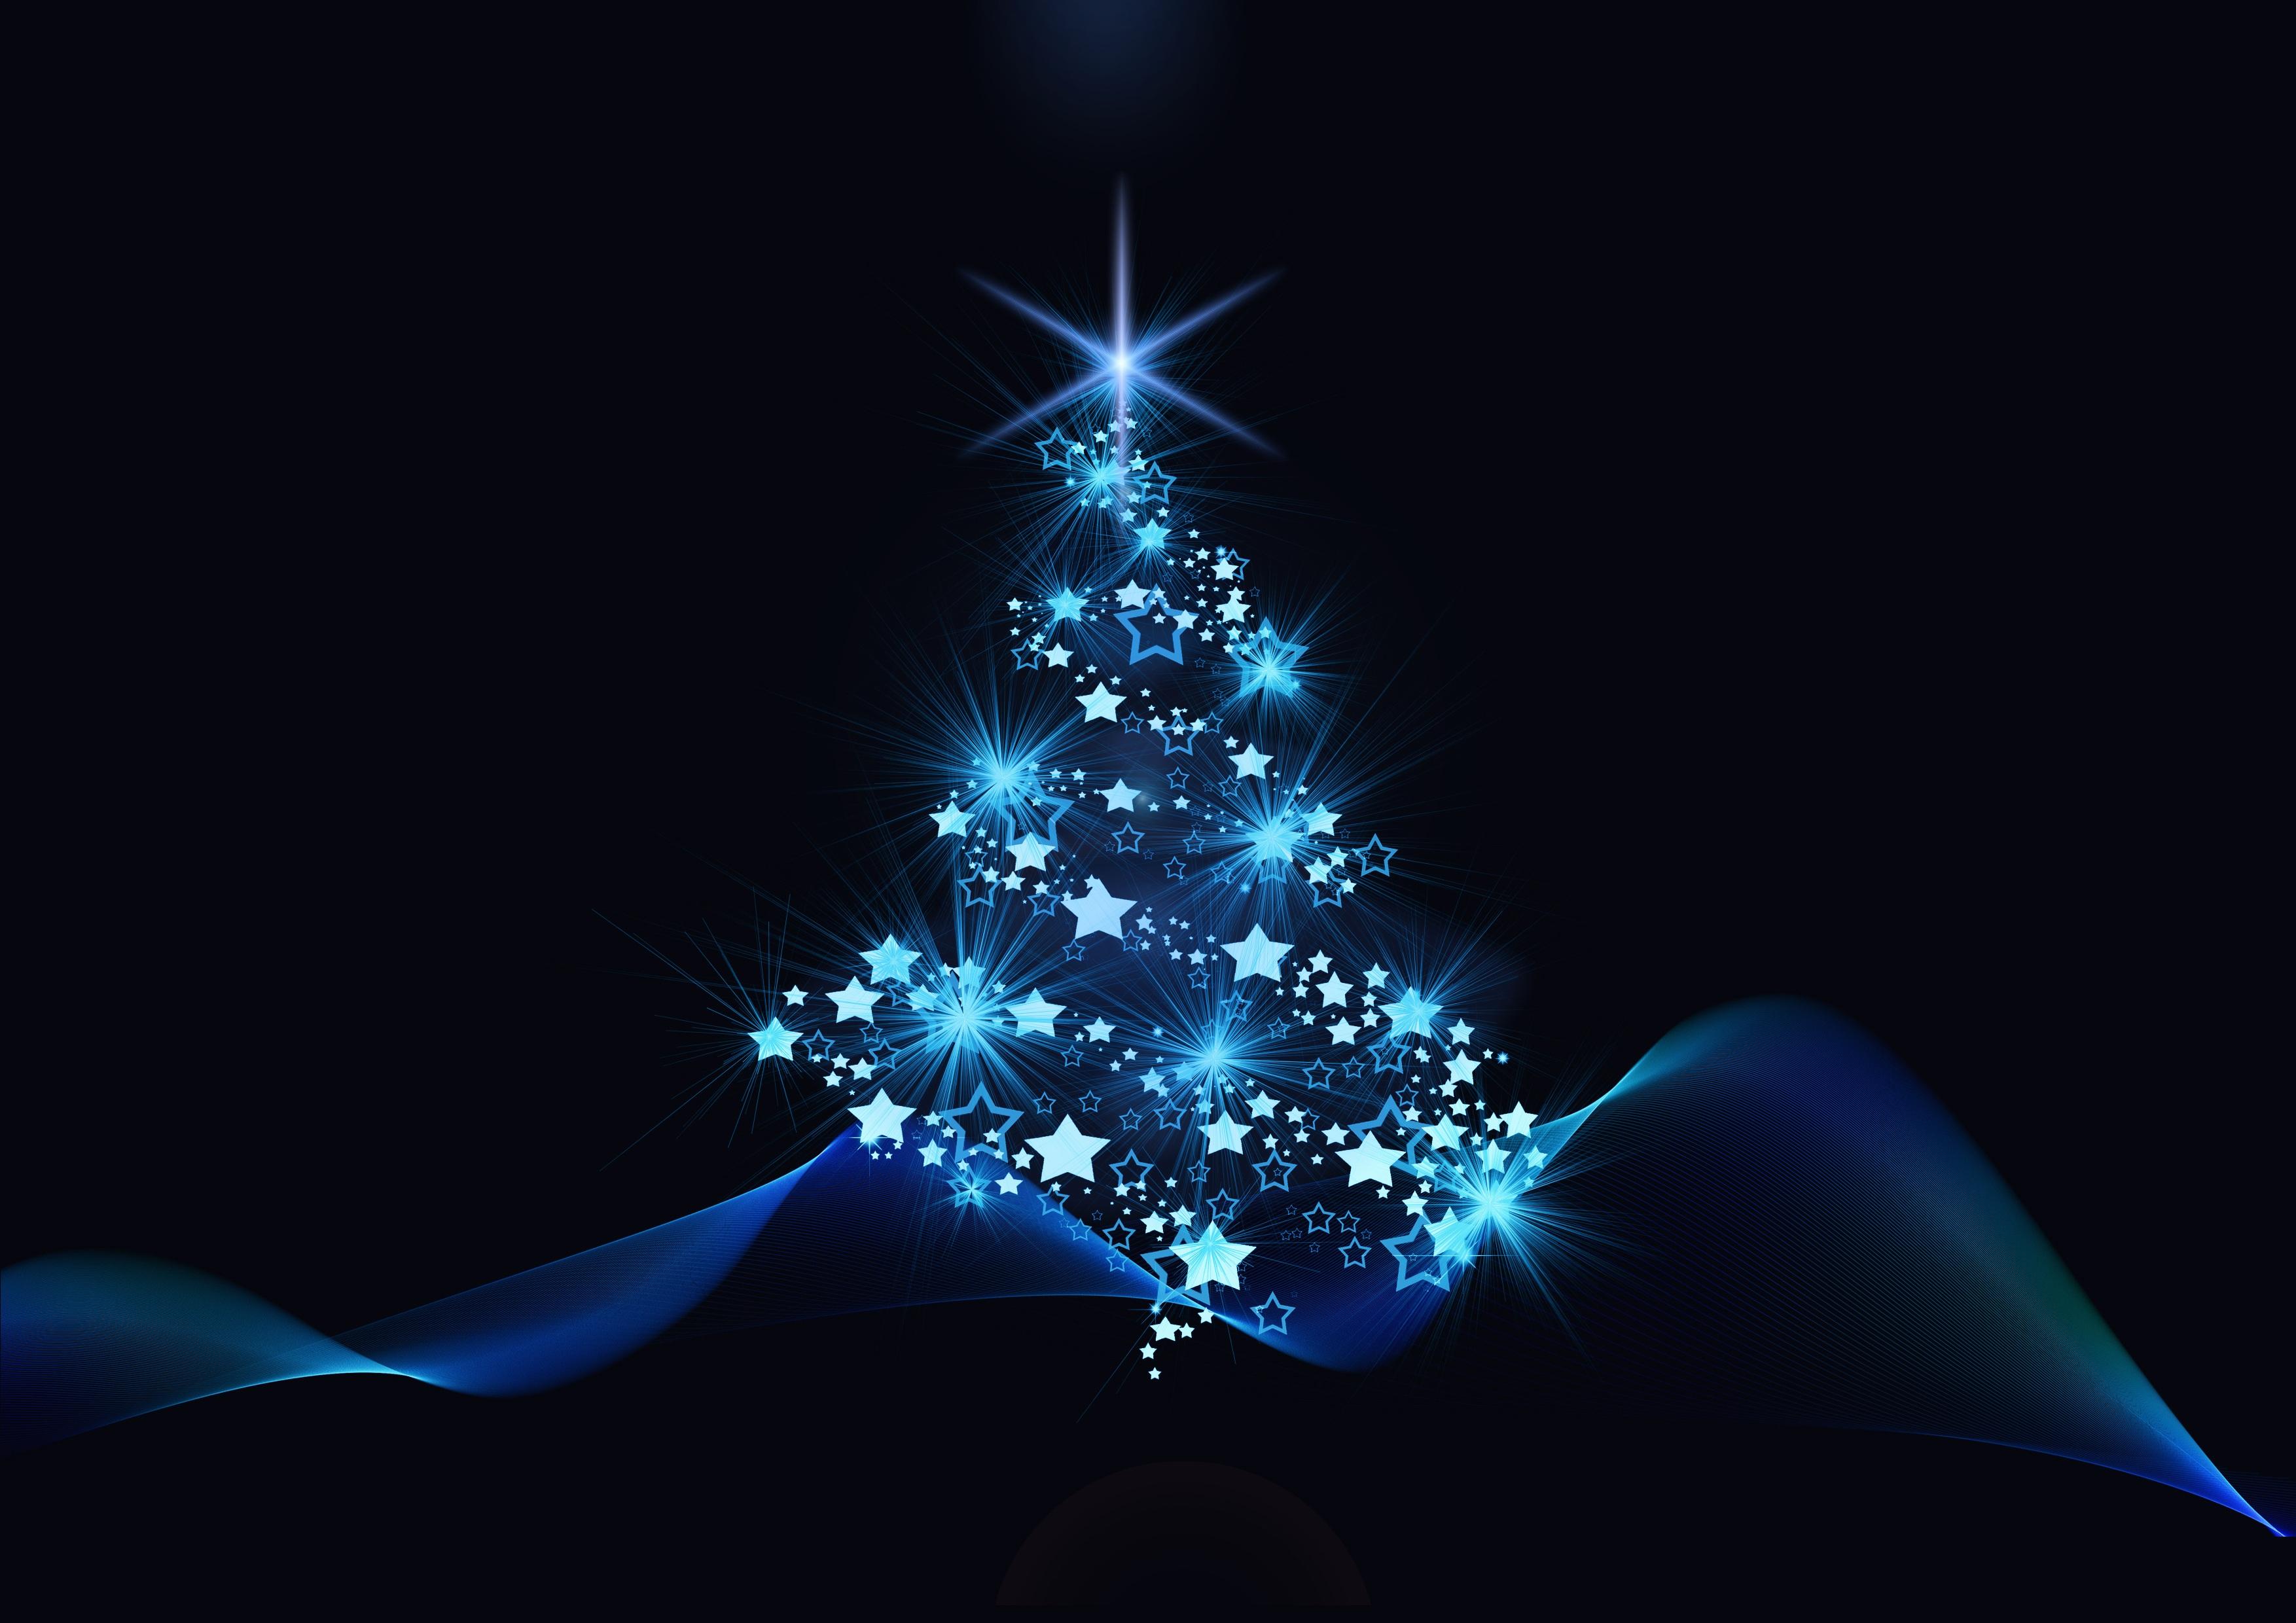 blue christmas tree fond d 39 cran hd arri re plan. Black Bedroom Furniture Sets. Home Design Ideas